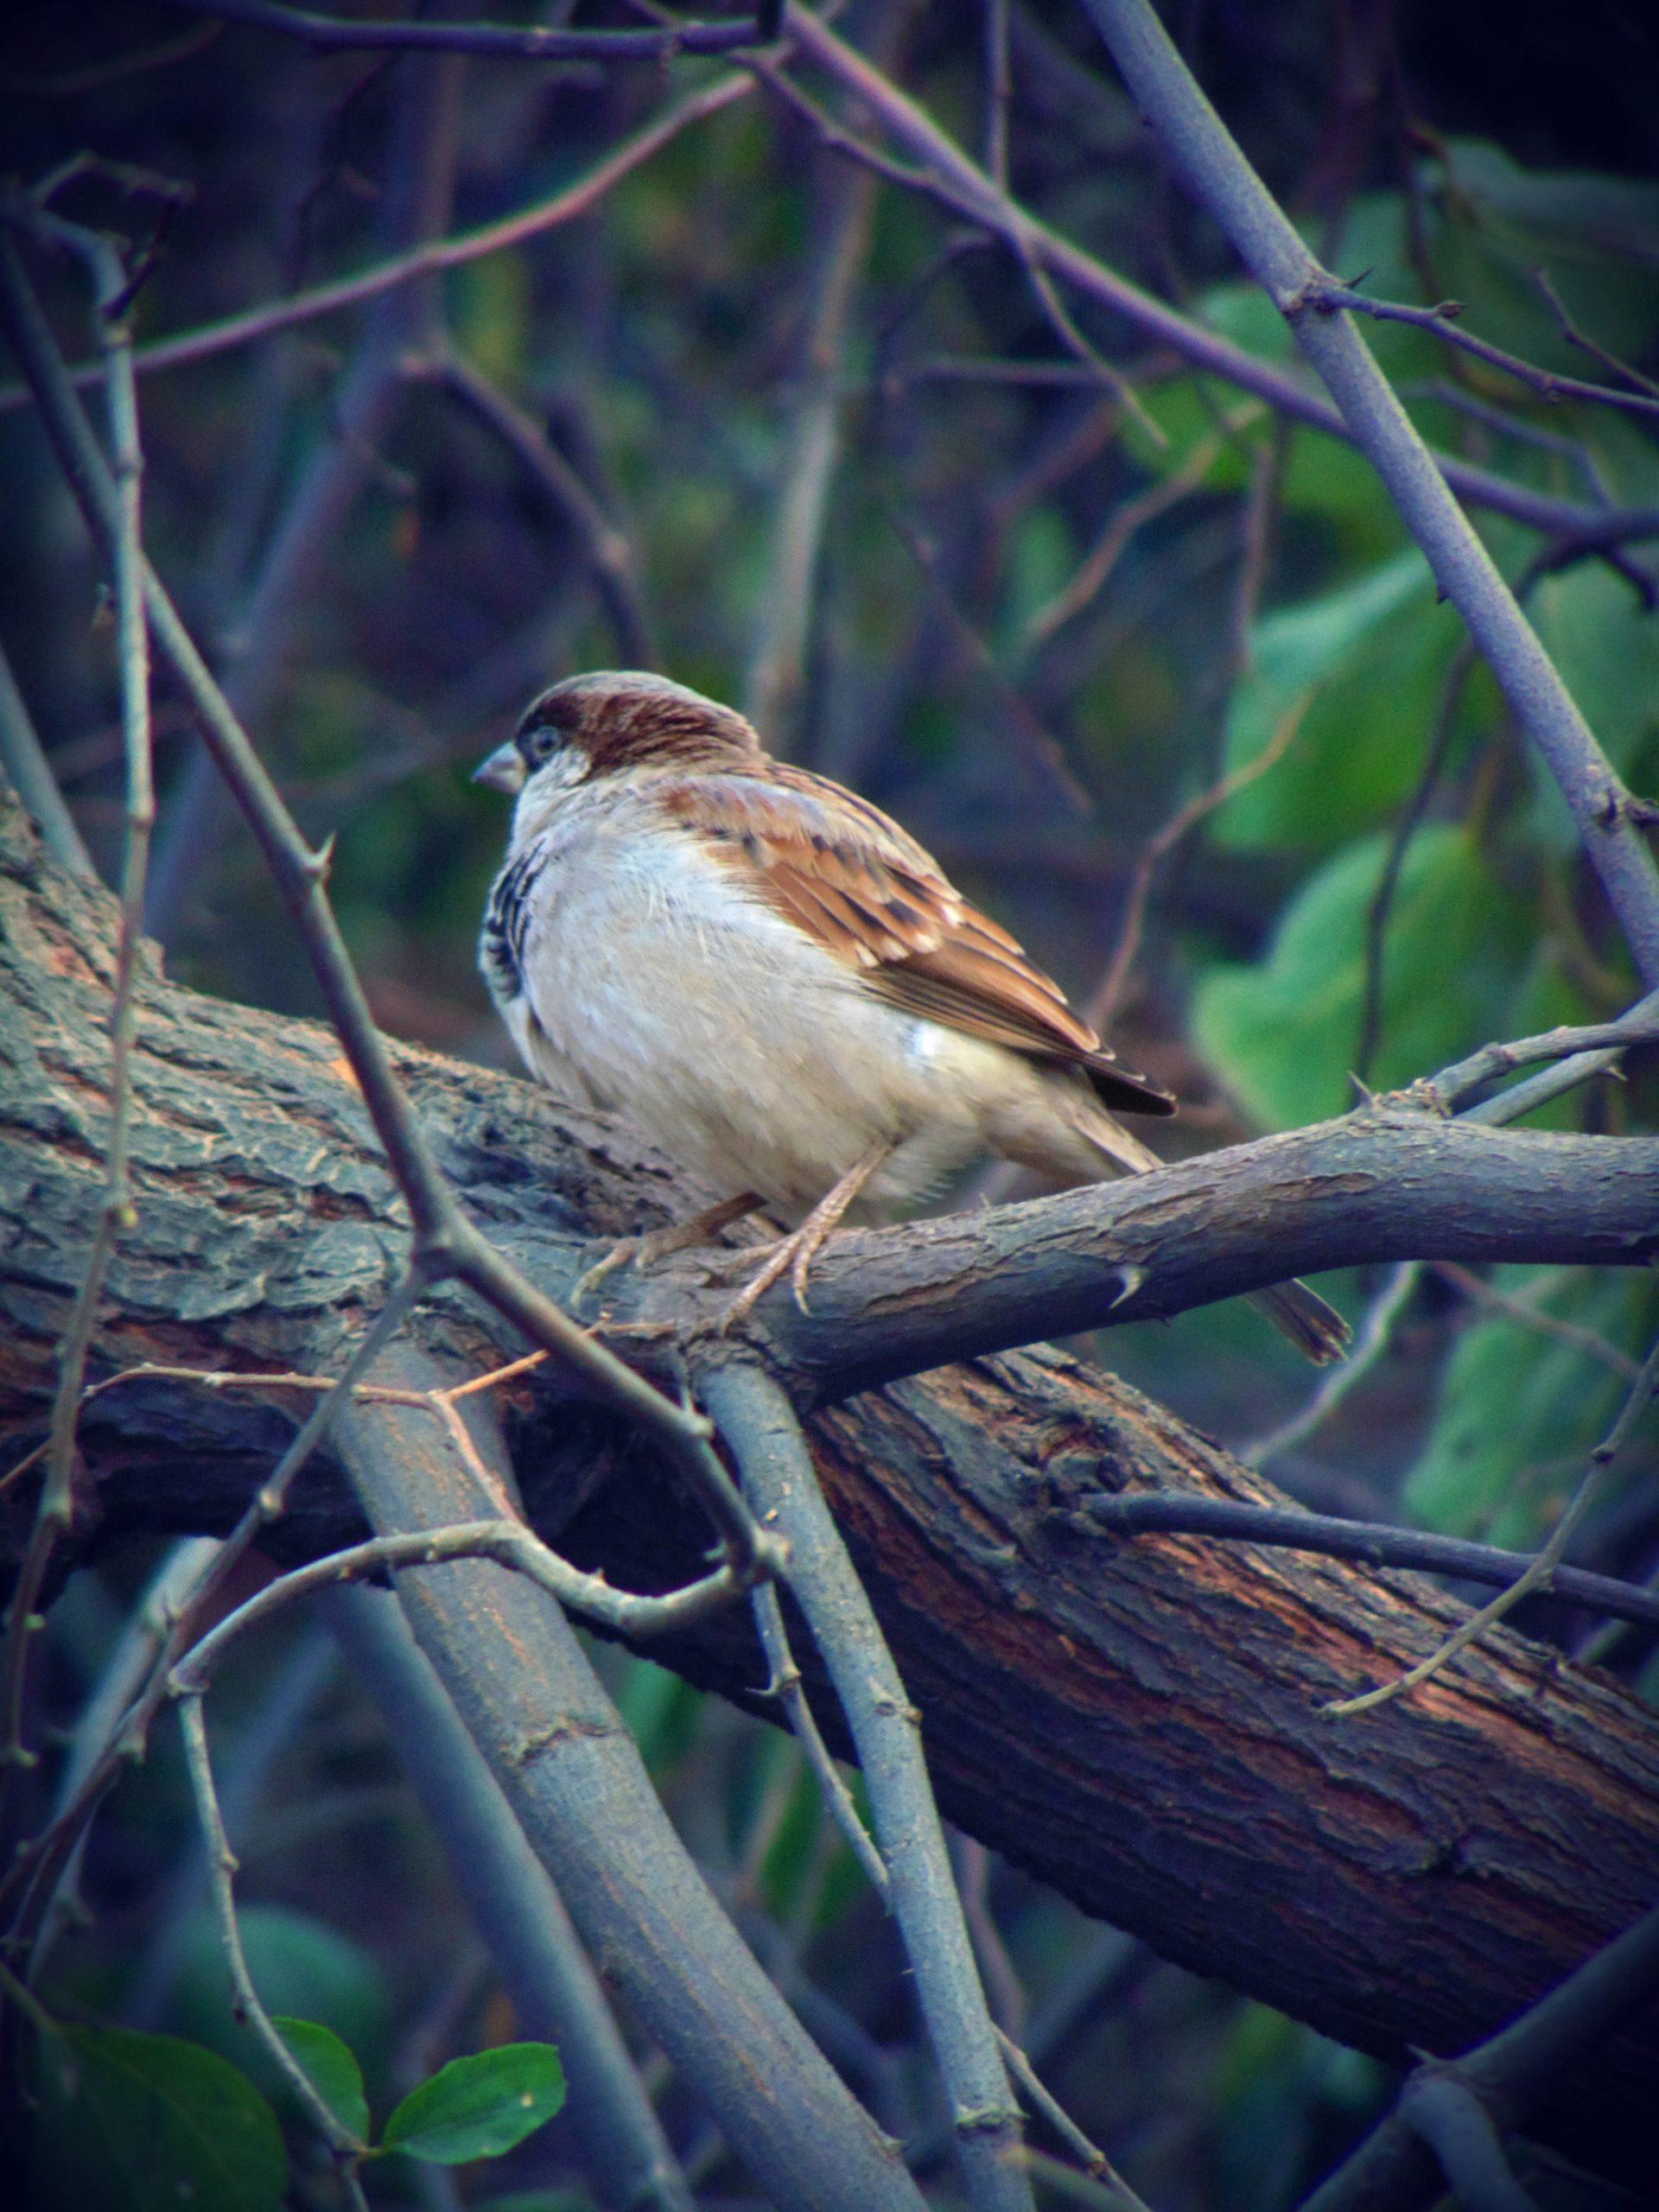 Bird sitting on the tree branch